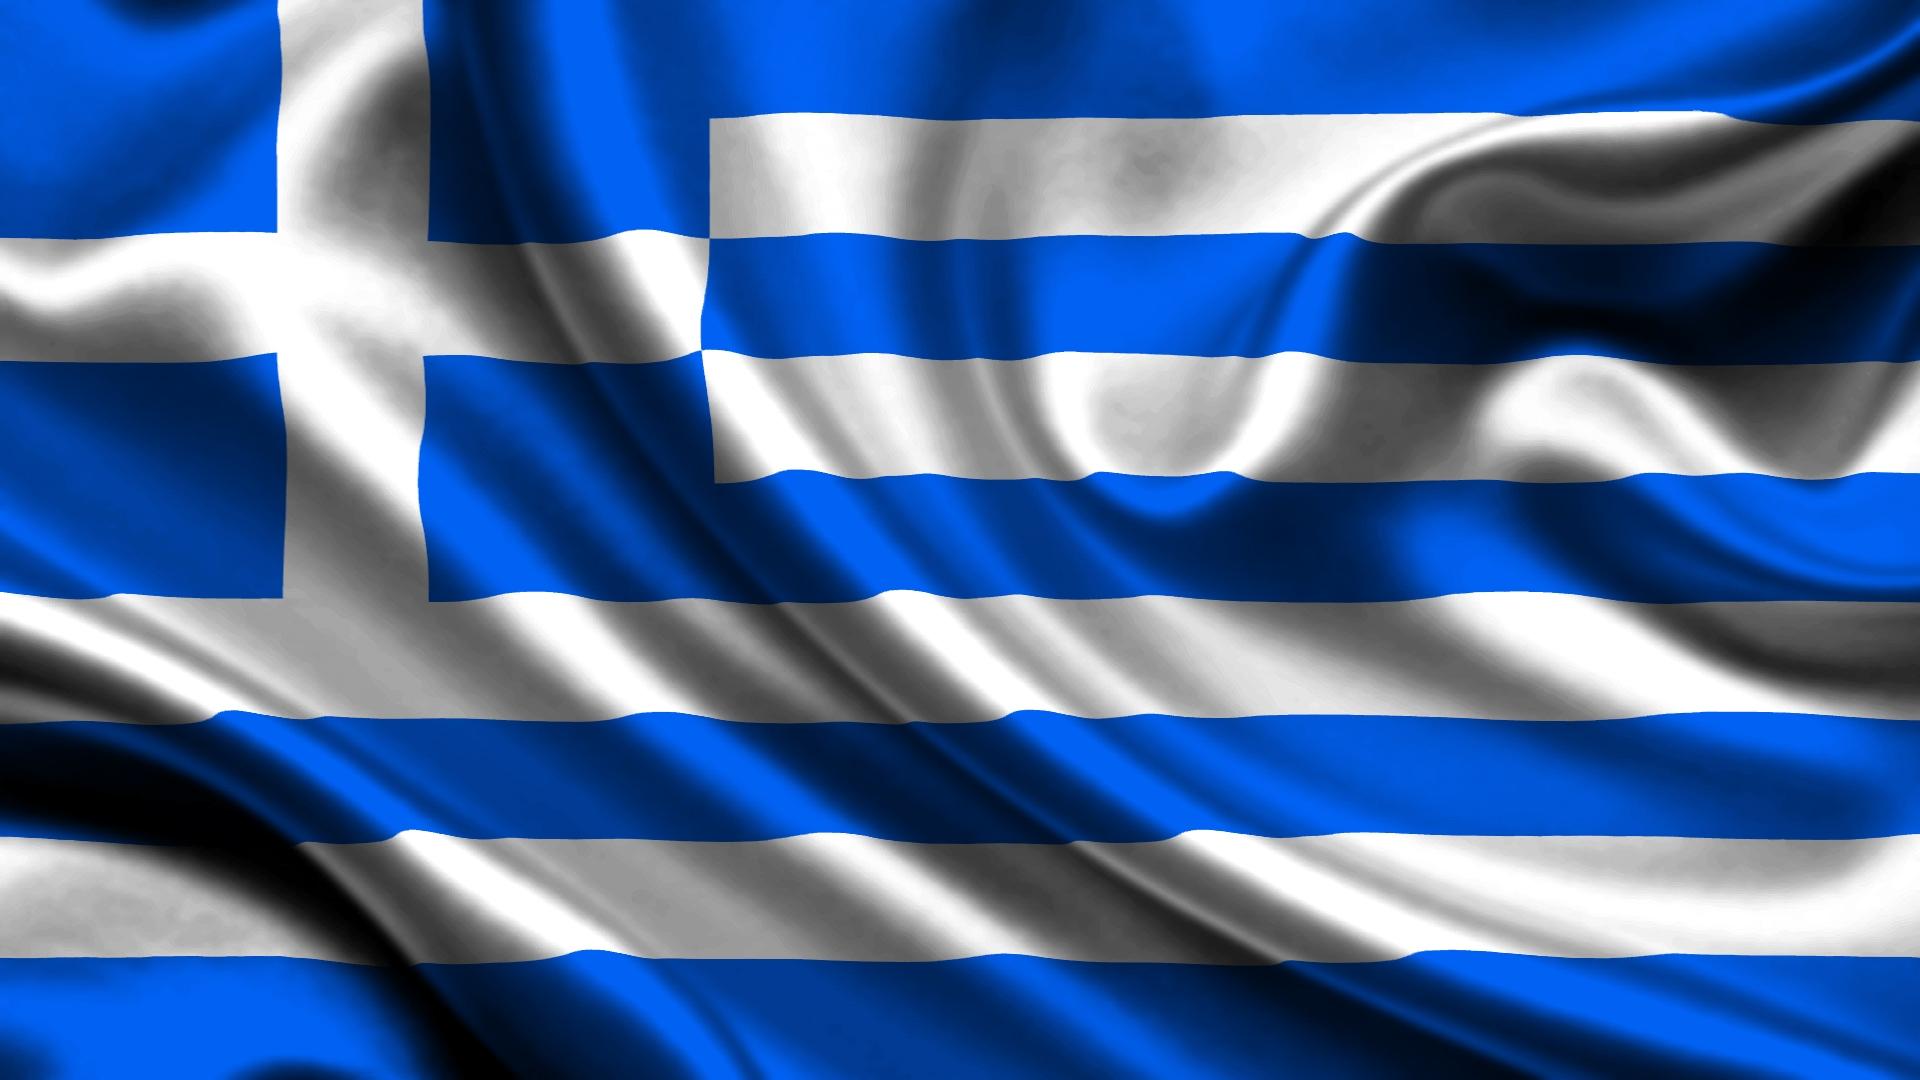 greciya_atlas_flag_shelk_tkan_69799_1920x1080